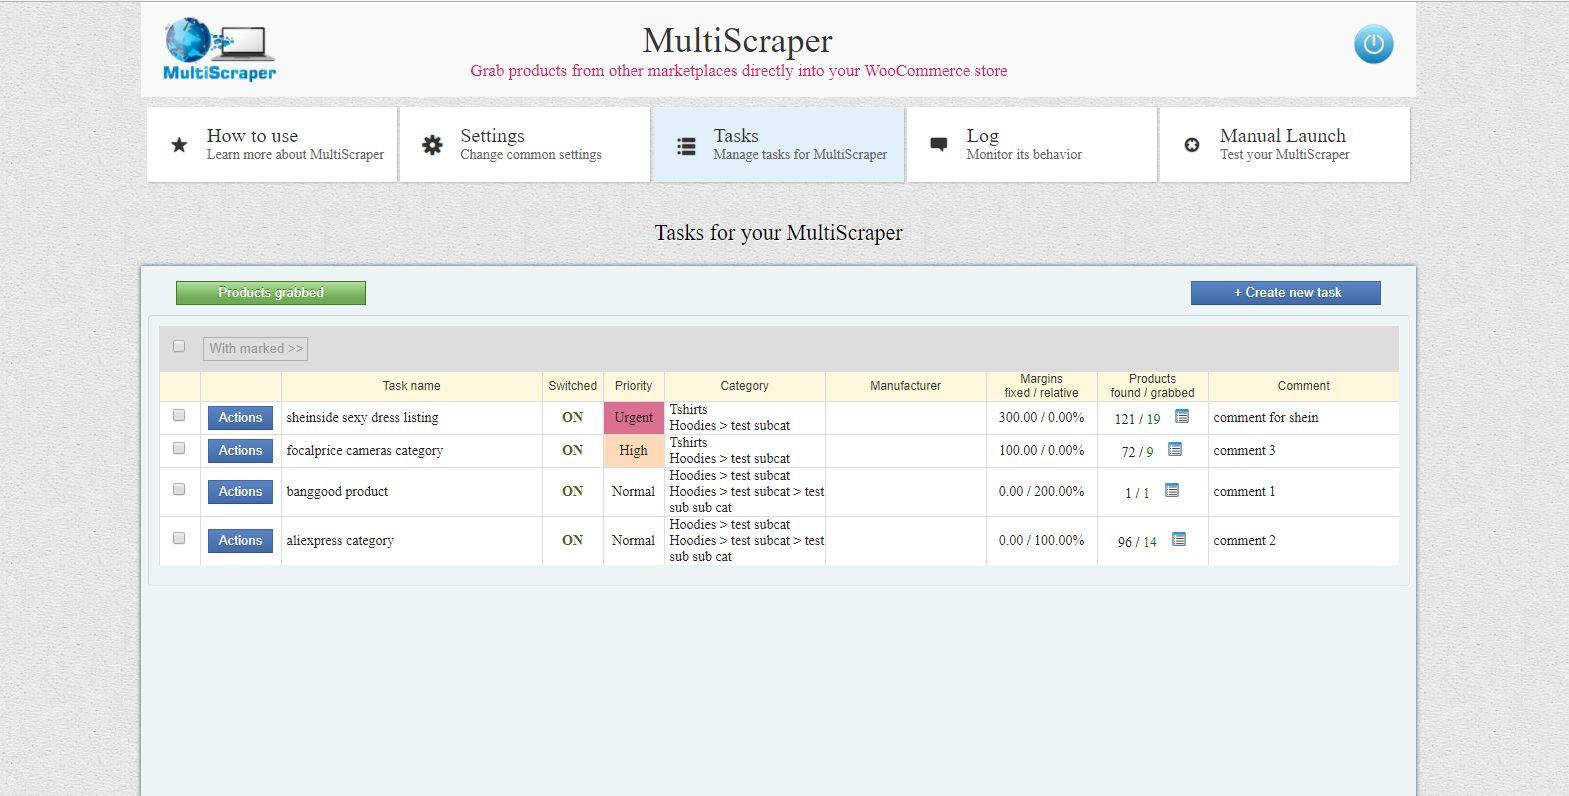 MultiScraper For WooCommerce